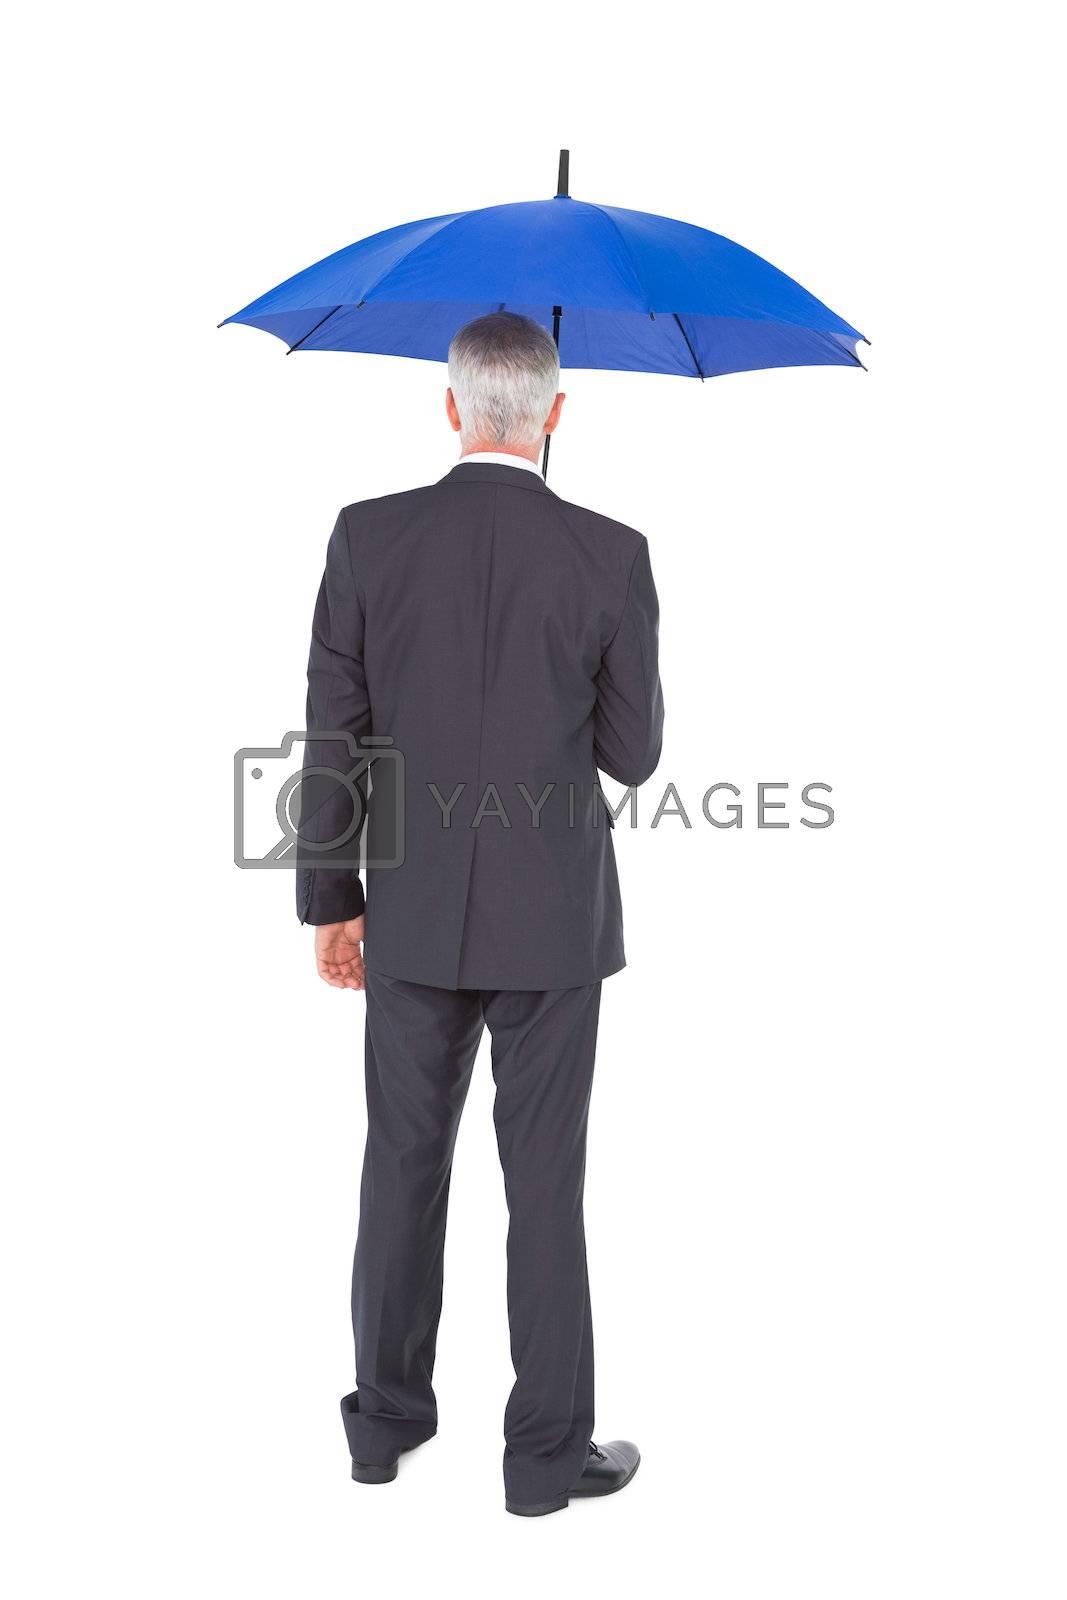 Rear view of mature businessman holding blue umbrella by Wavebreakmedia